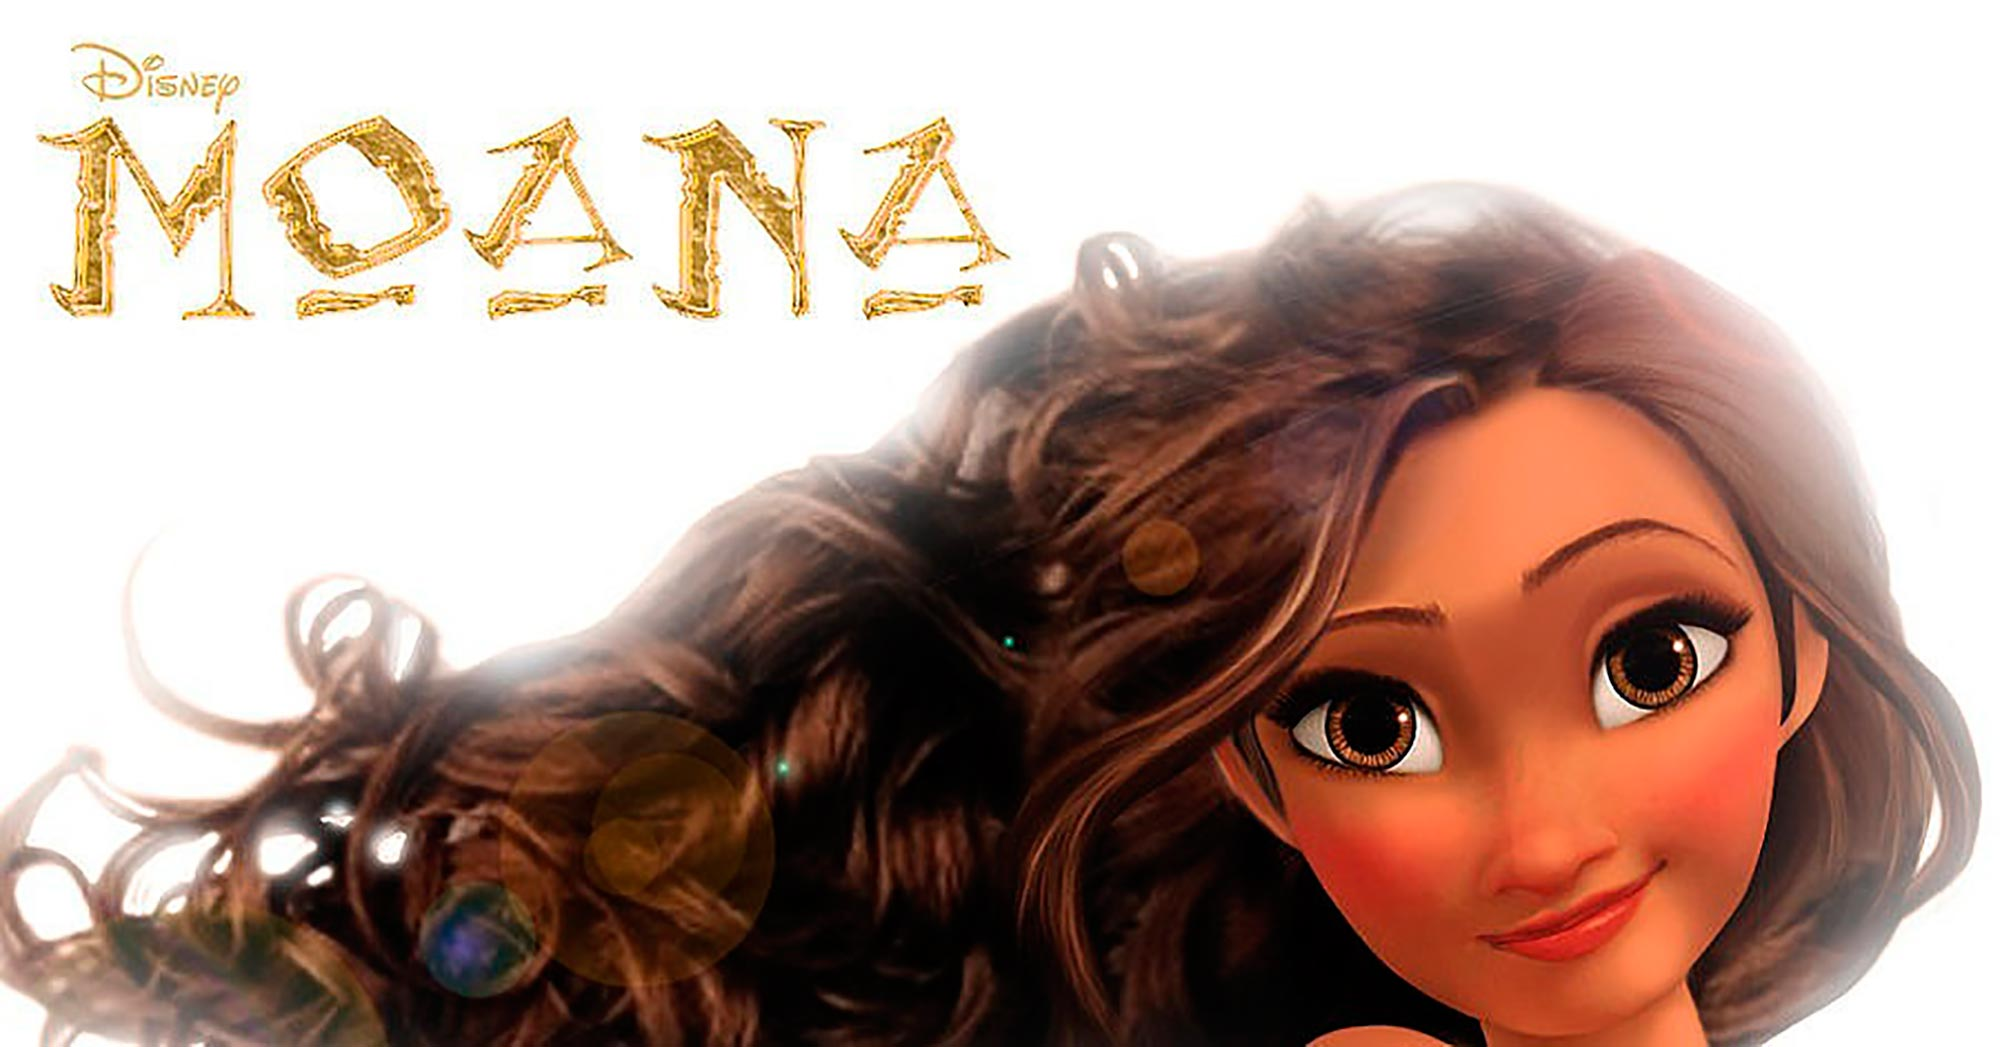 Dibujo Para Colorear De Maui Personaje Película Moana: Moana Disney Dibujos Para Colorear